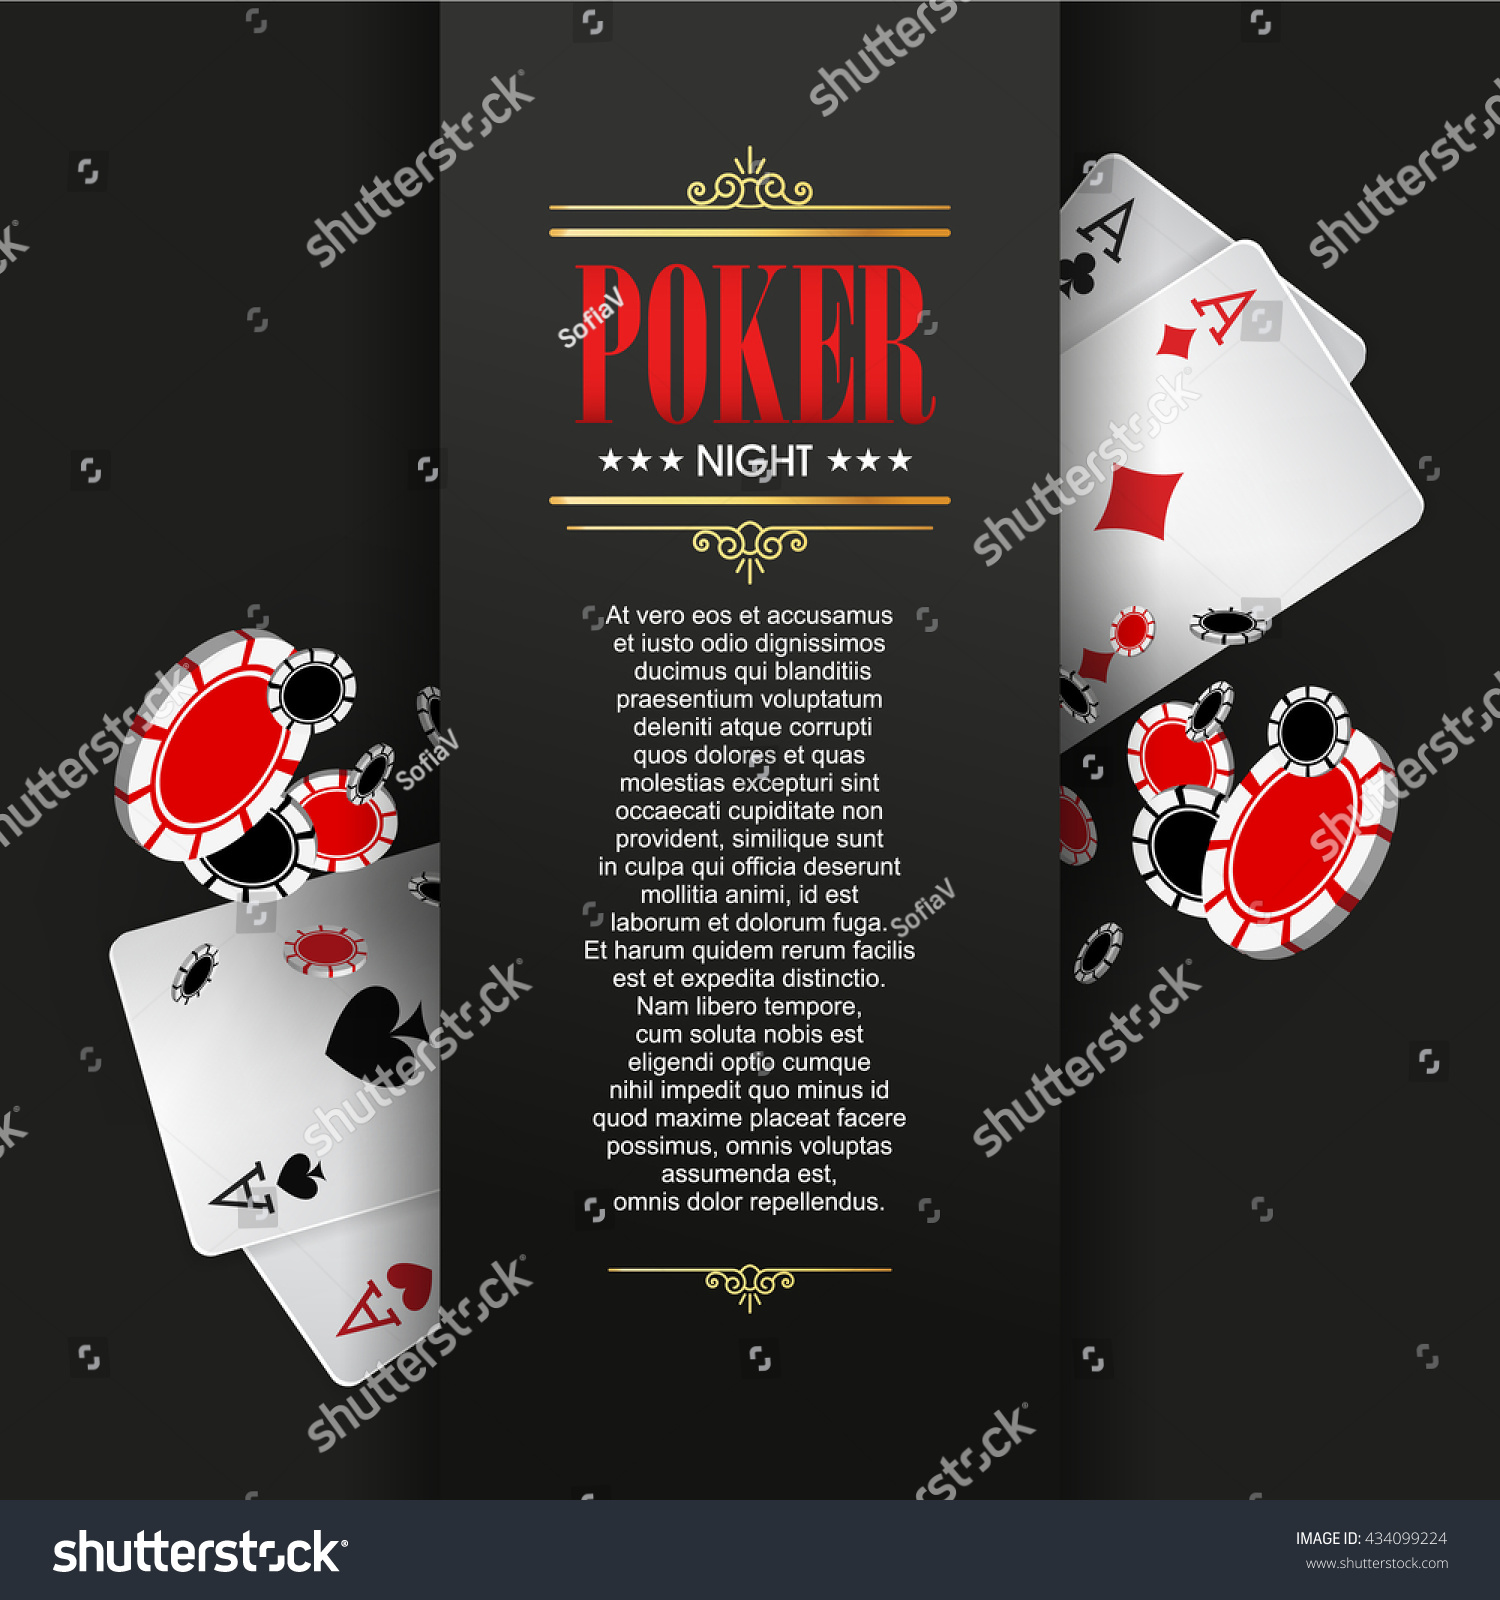 casino poster banner background flyer template のベクター画像素材